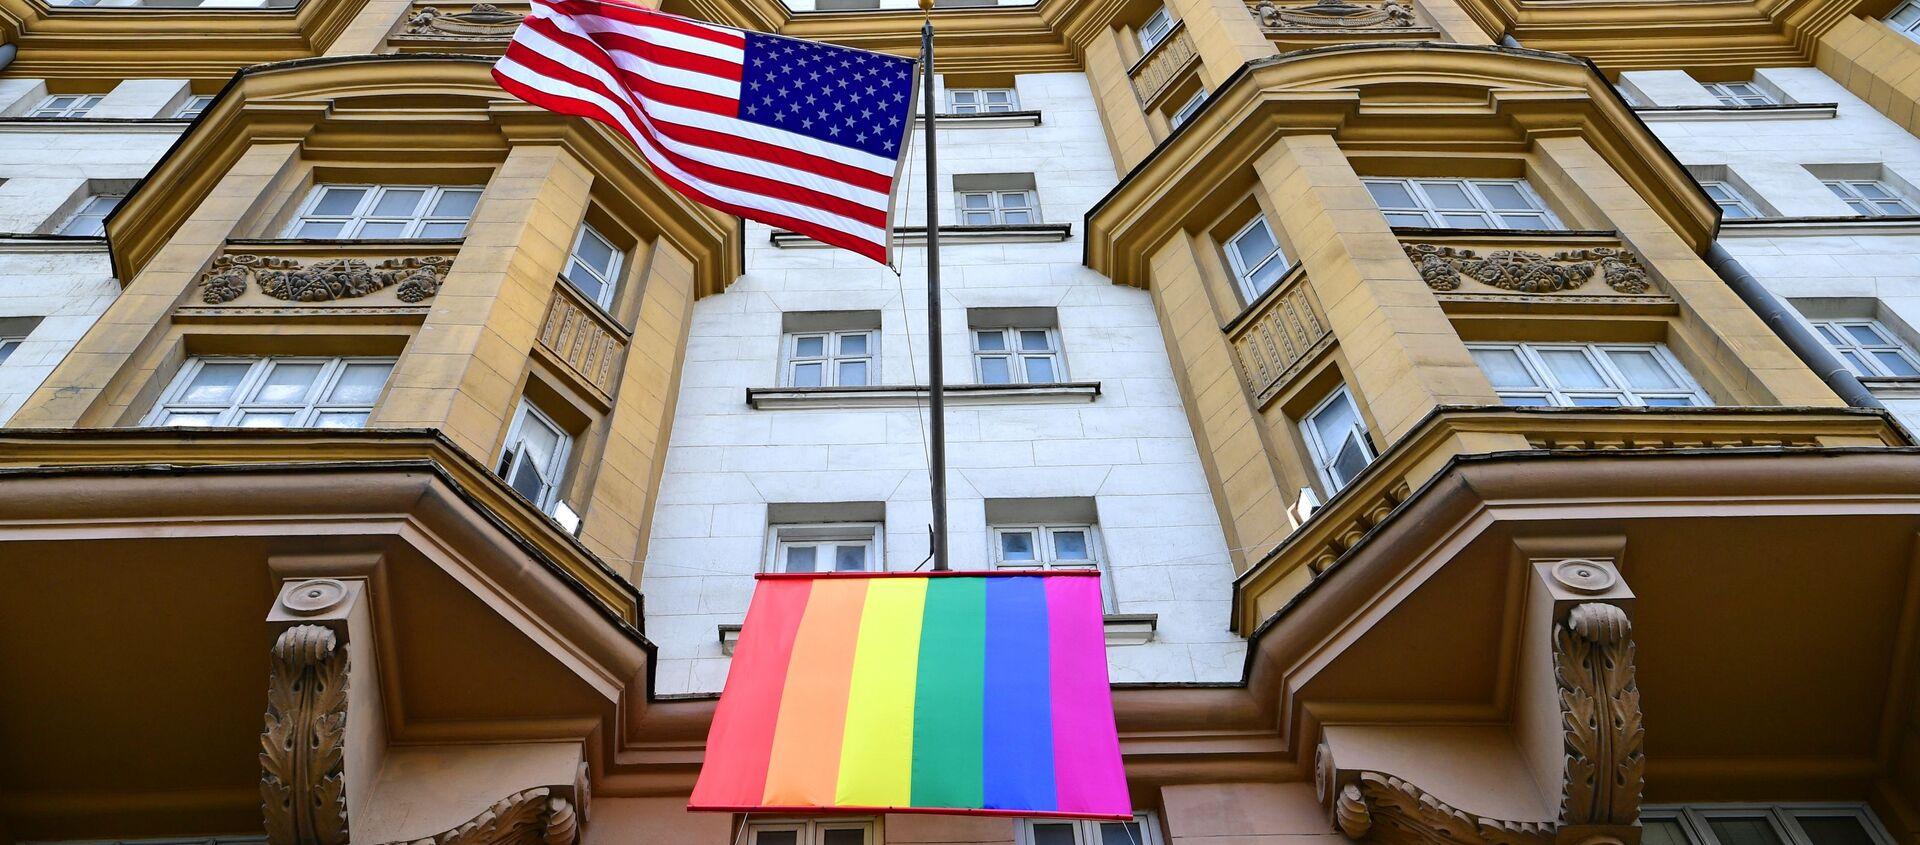 Ambasada USA w Moskwie - Sputnik Polska, 1920, 06.02.2021